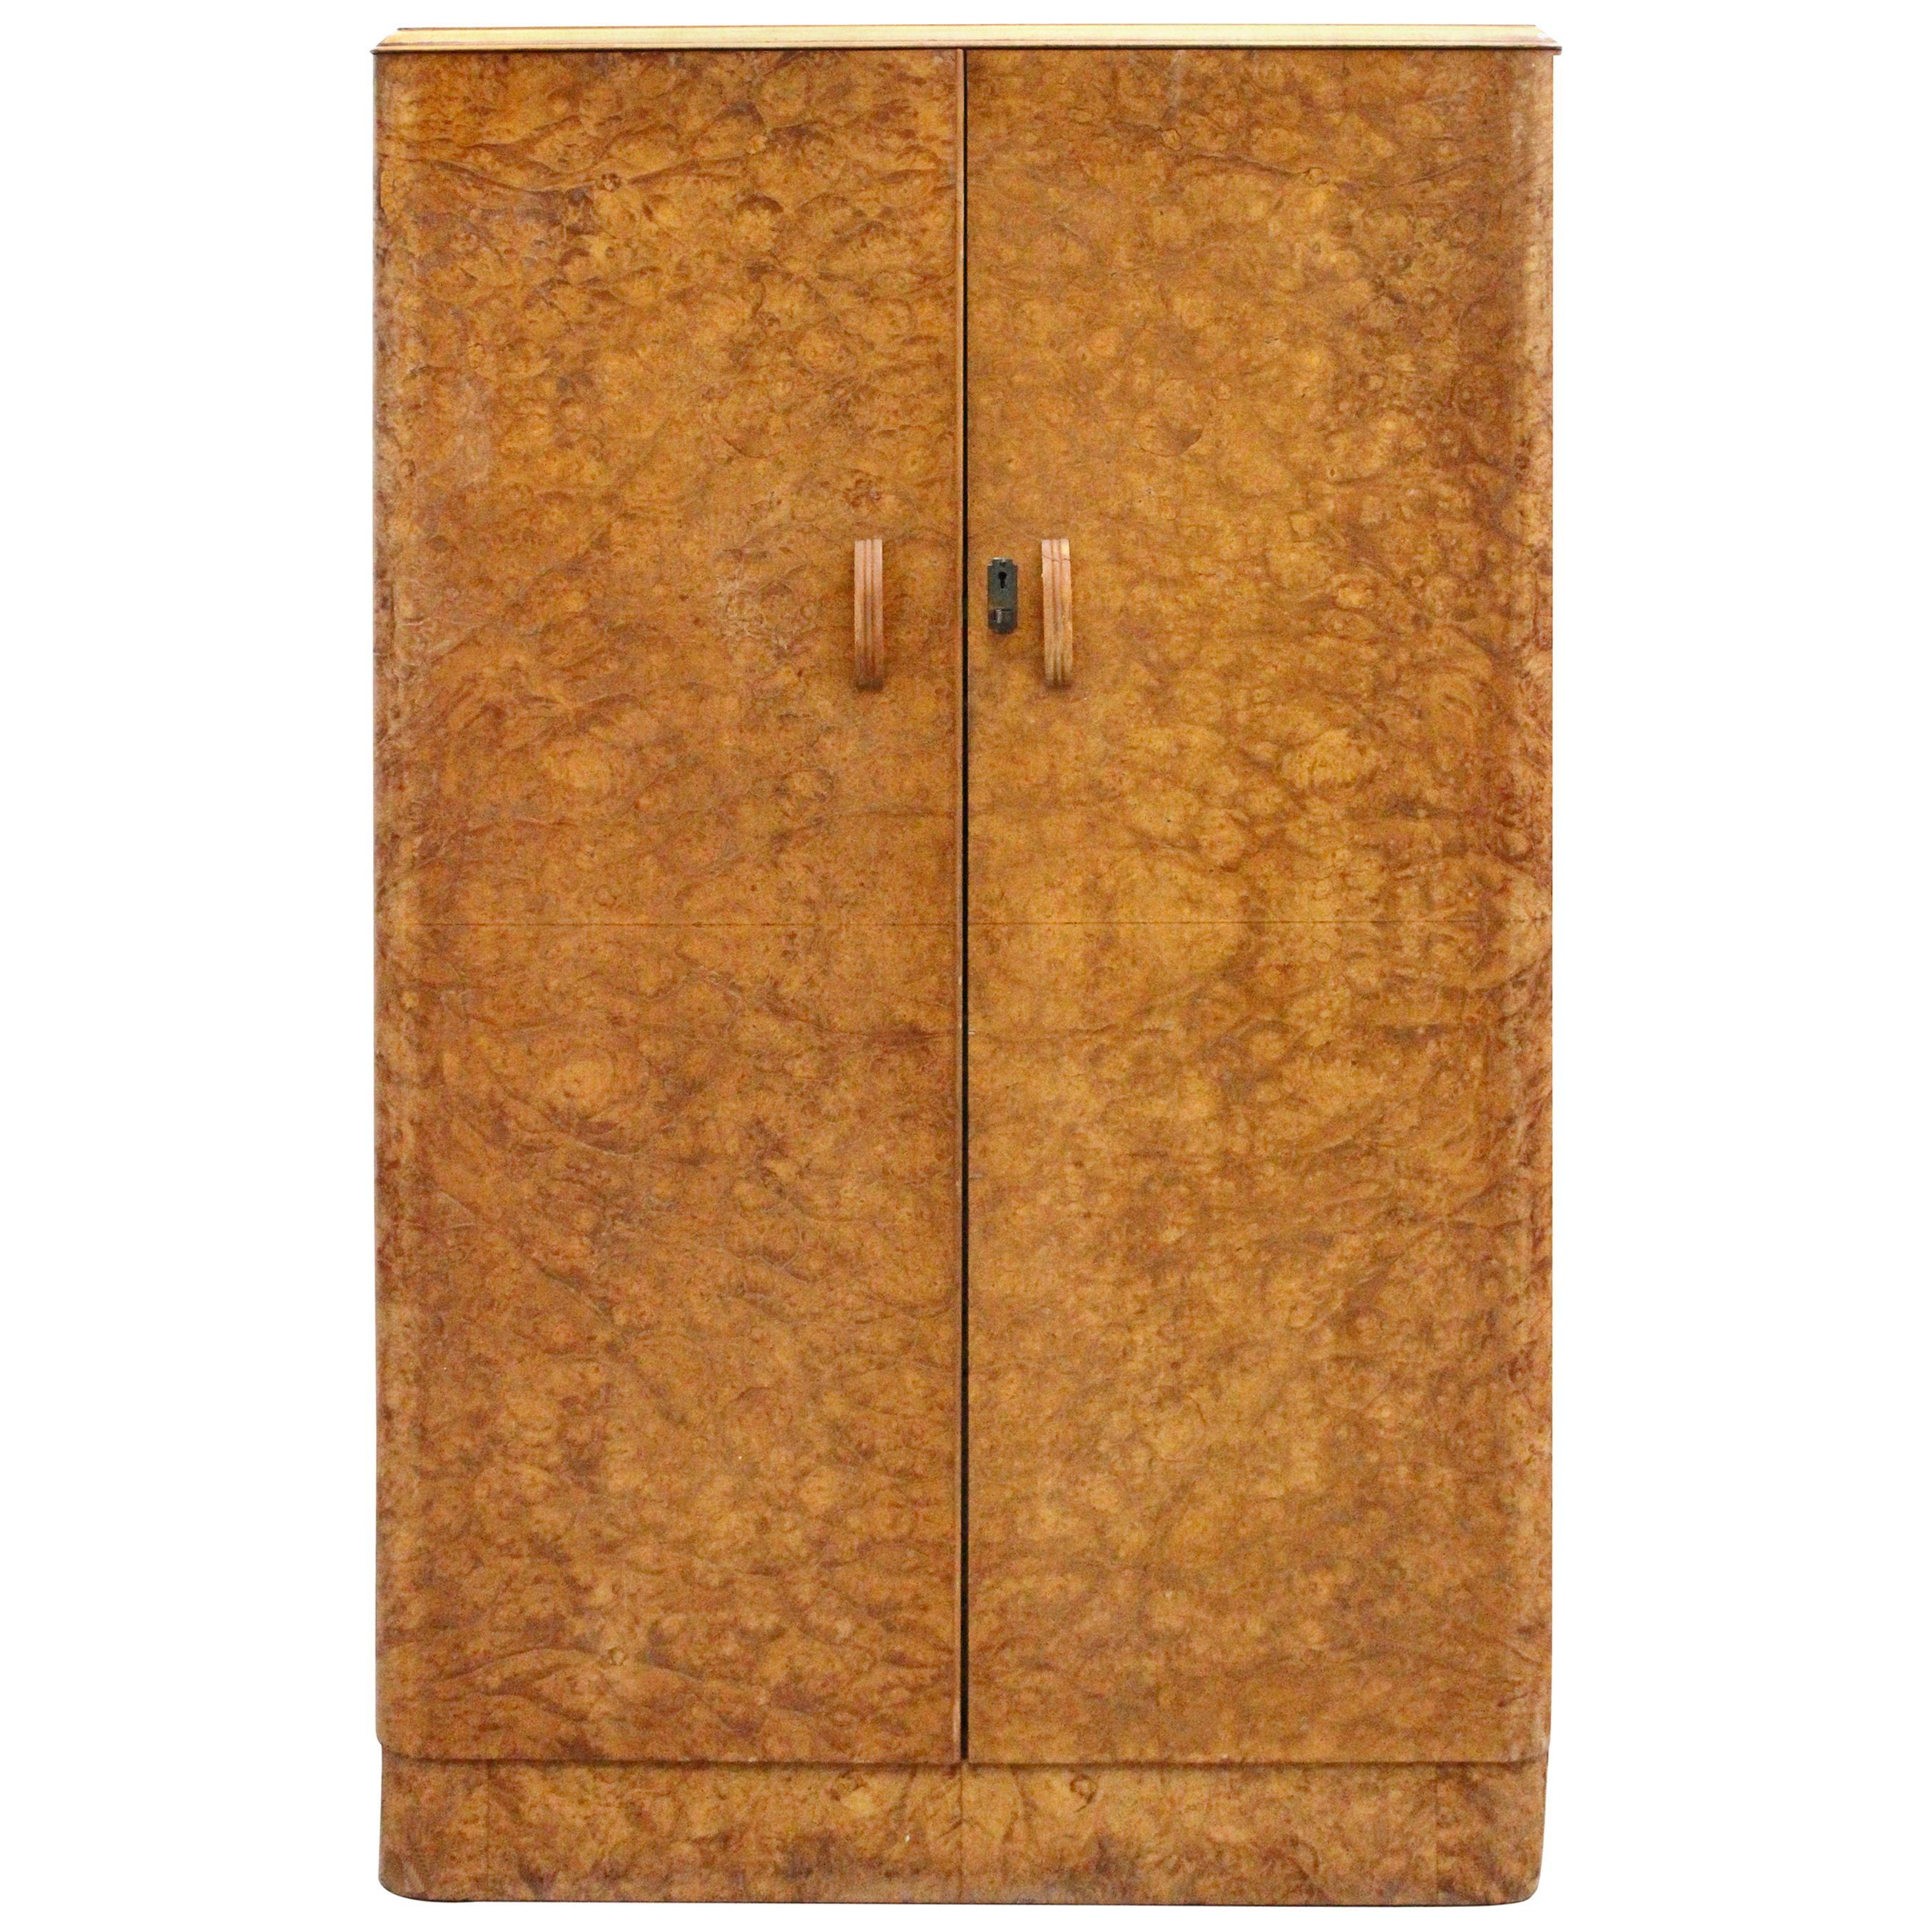 Art Deco Walnut Tallboy Linen Cupboard, circa 1930